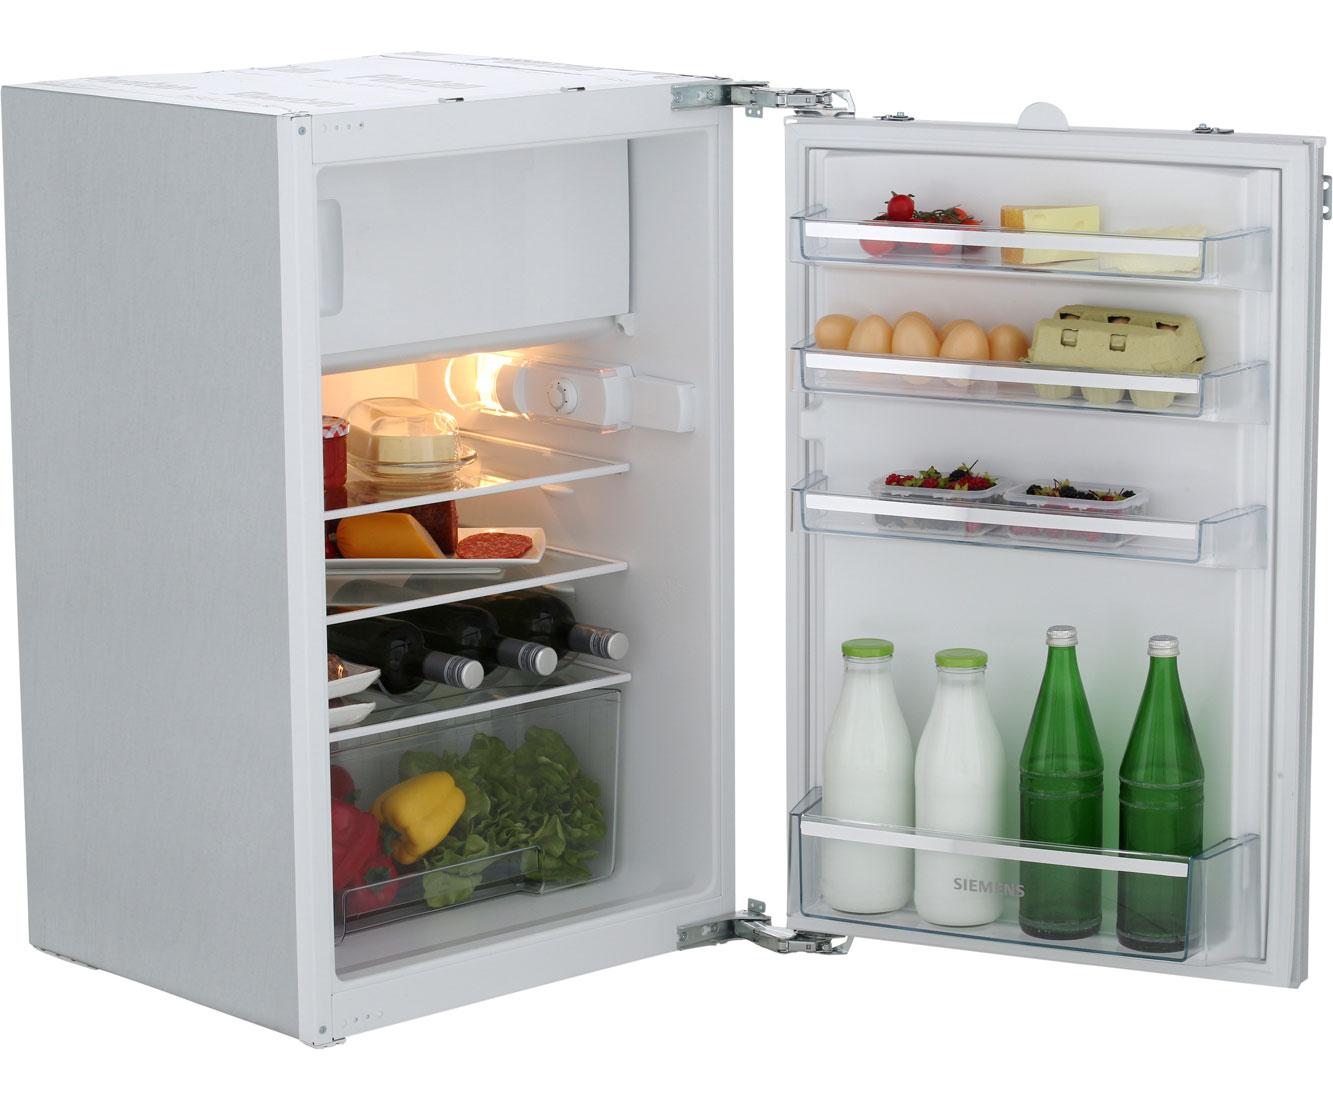 Siemens Kühlschrank Kg39eai40 : Siemens kühlschrank kg eai siemens kg eal youtube siemens kg